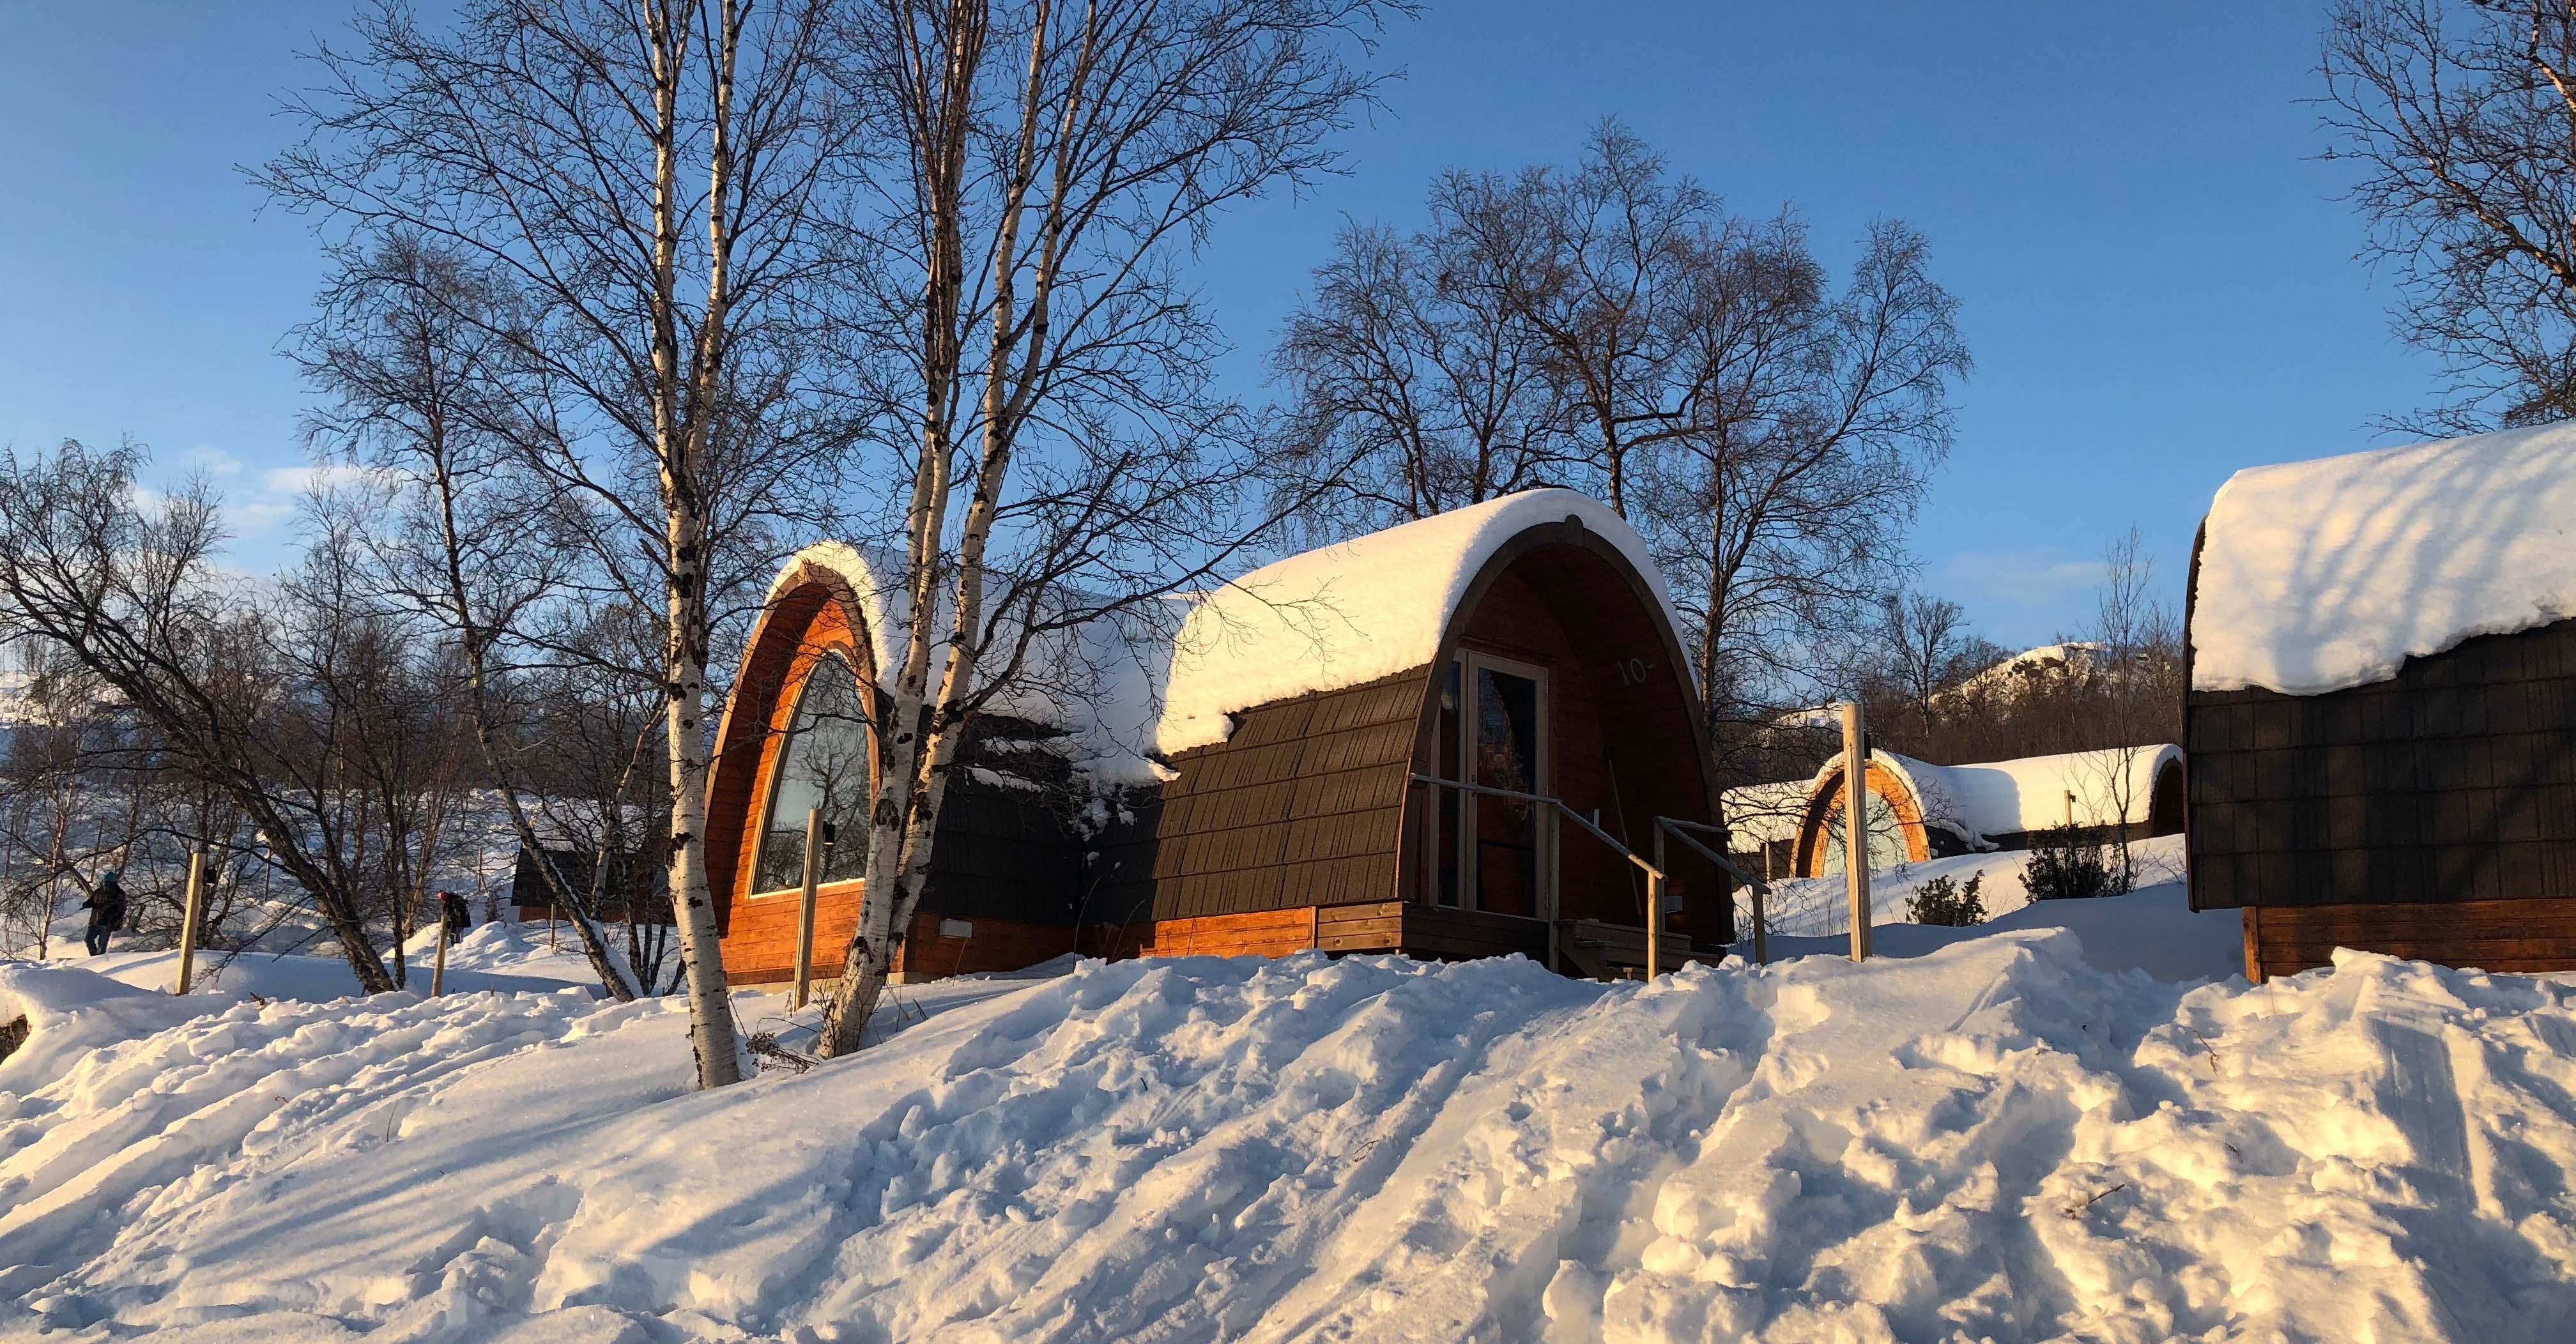 Hurtigruten snow hotel cabins